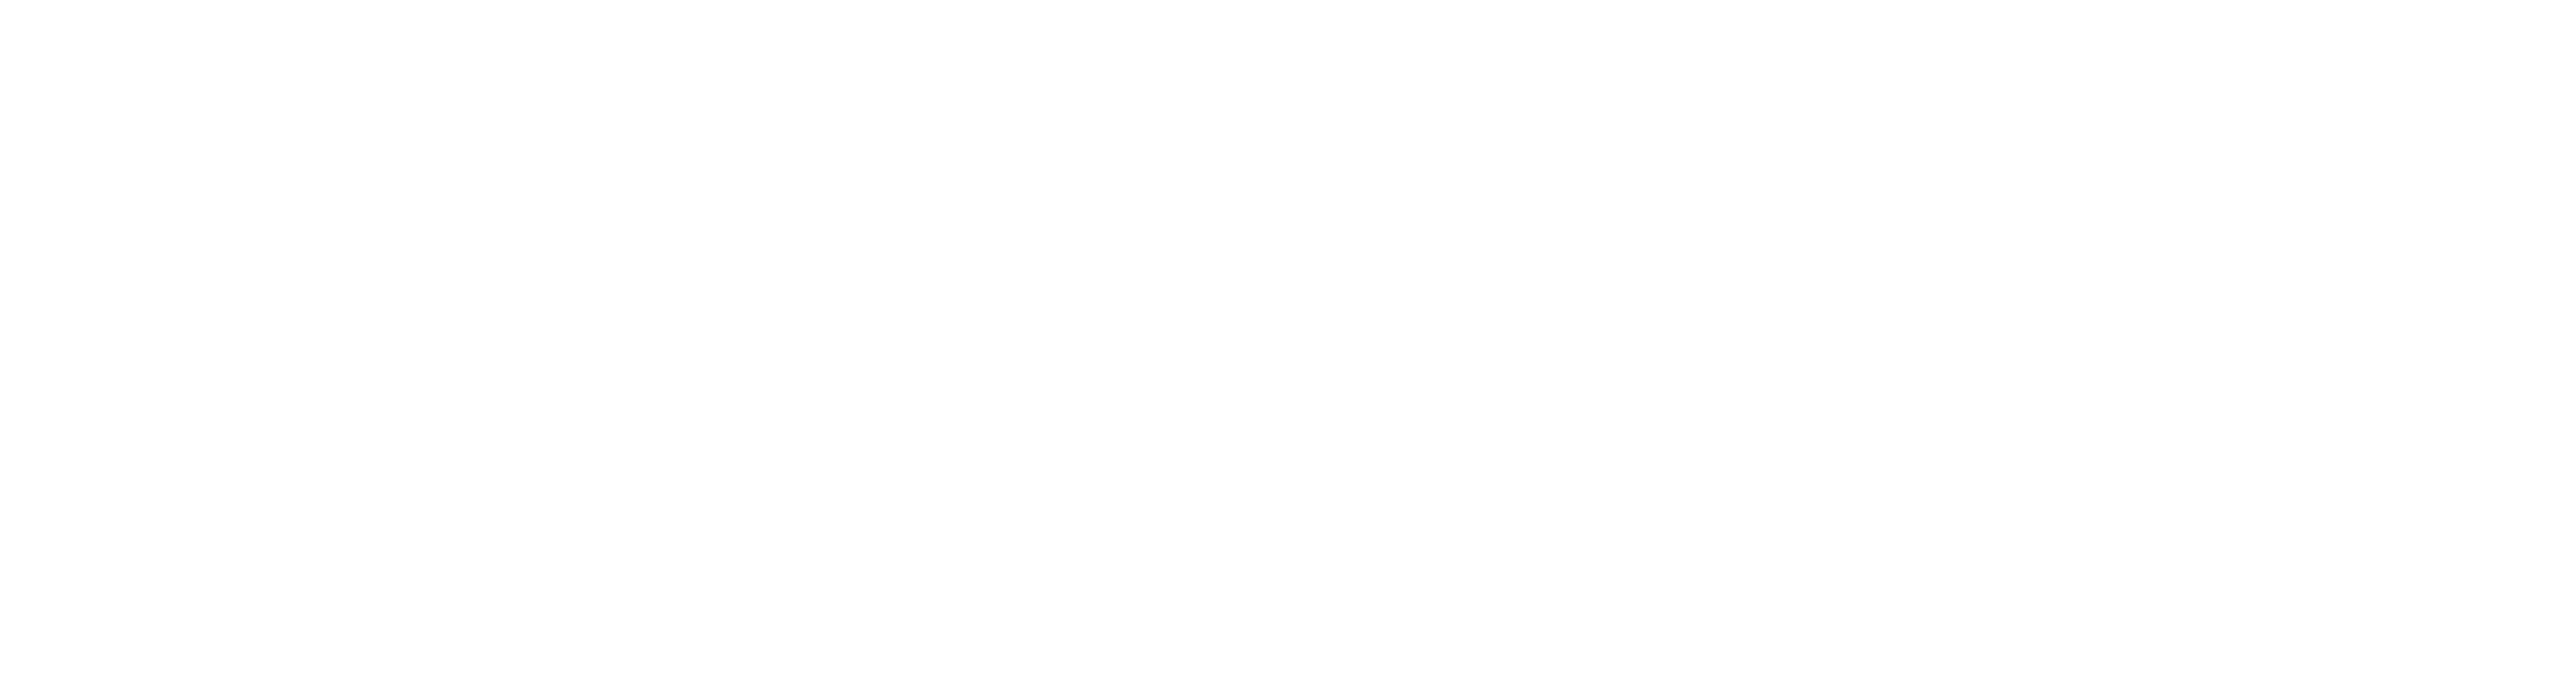 Chocolate Header